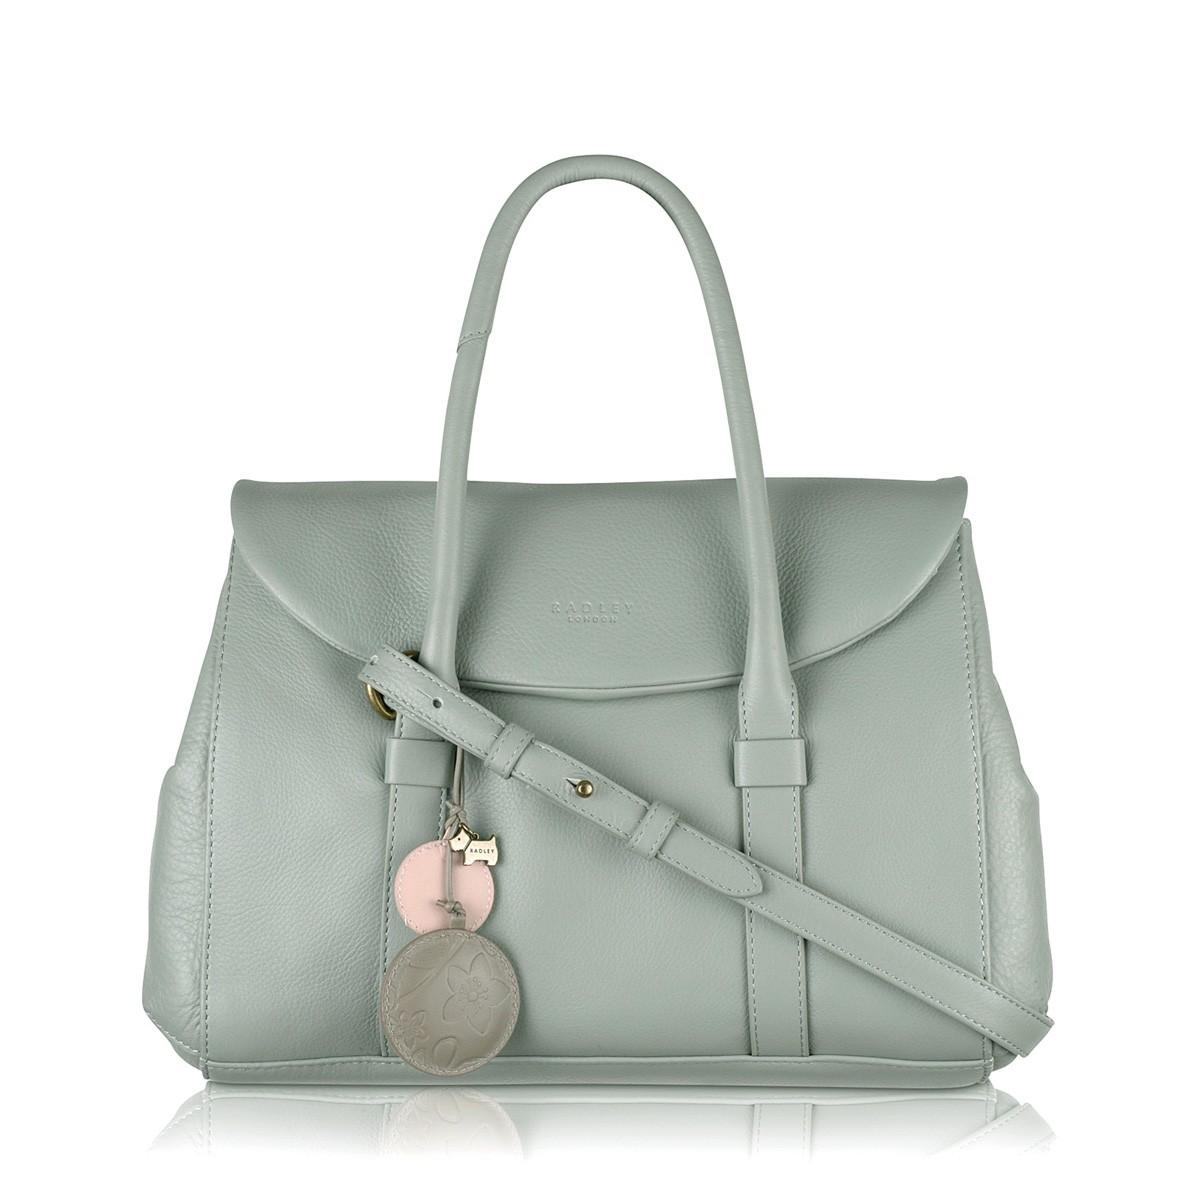 radley designer handbag